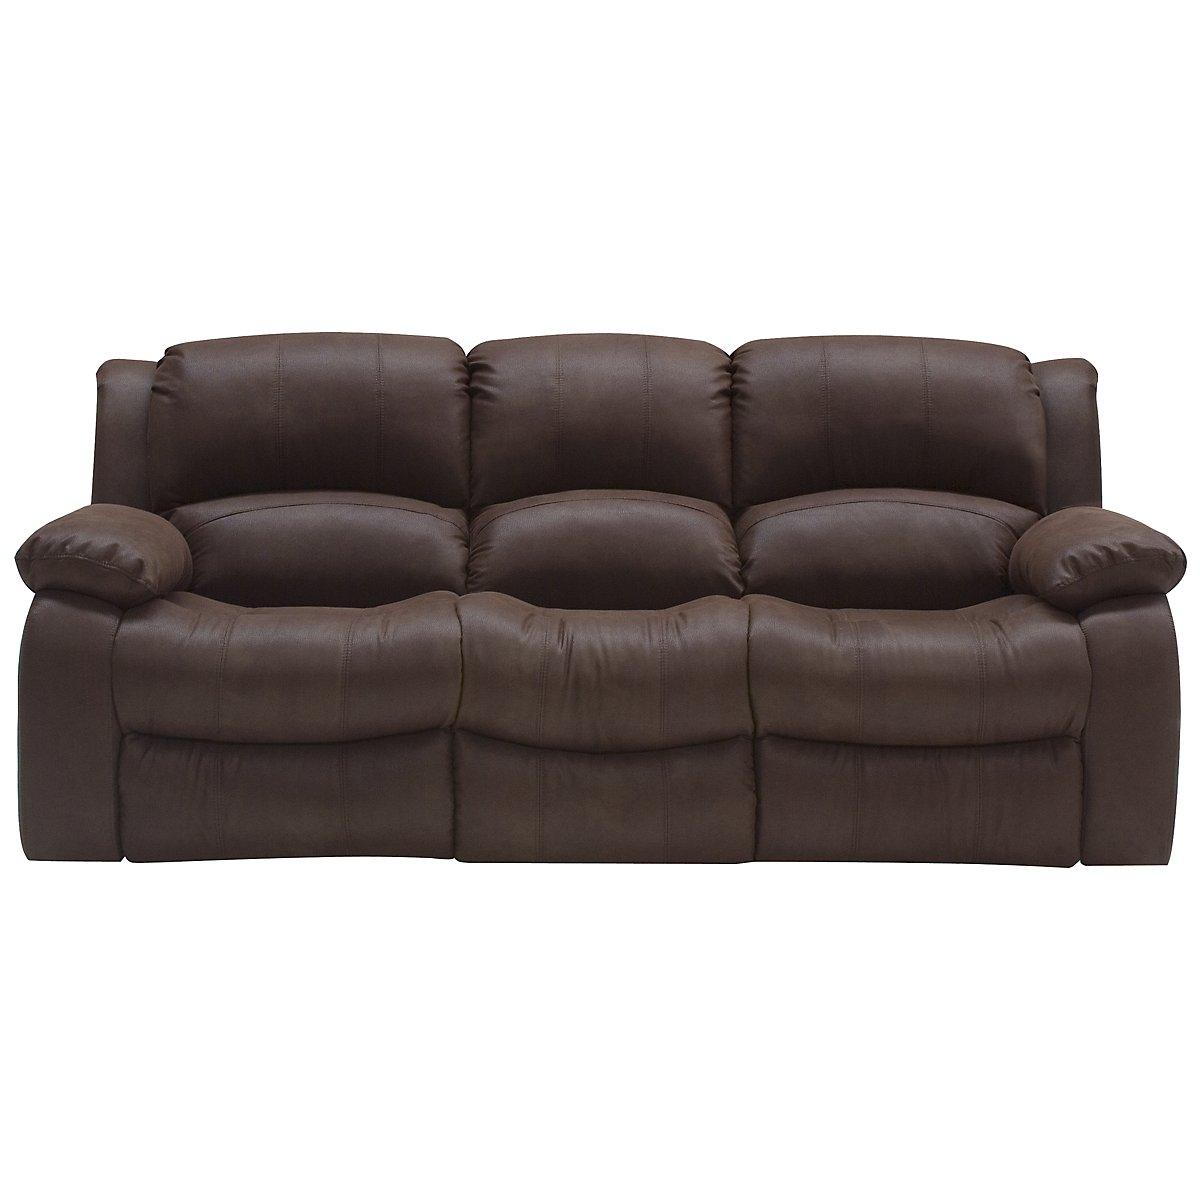 Tyler2 Dark Brown Microfiber Reclining Sofa